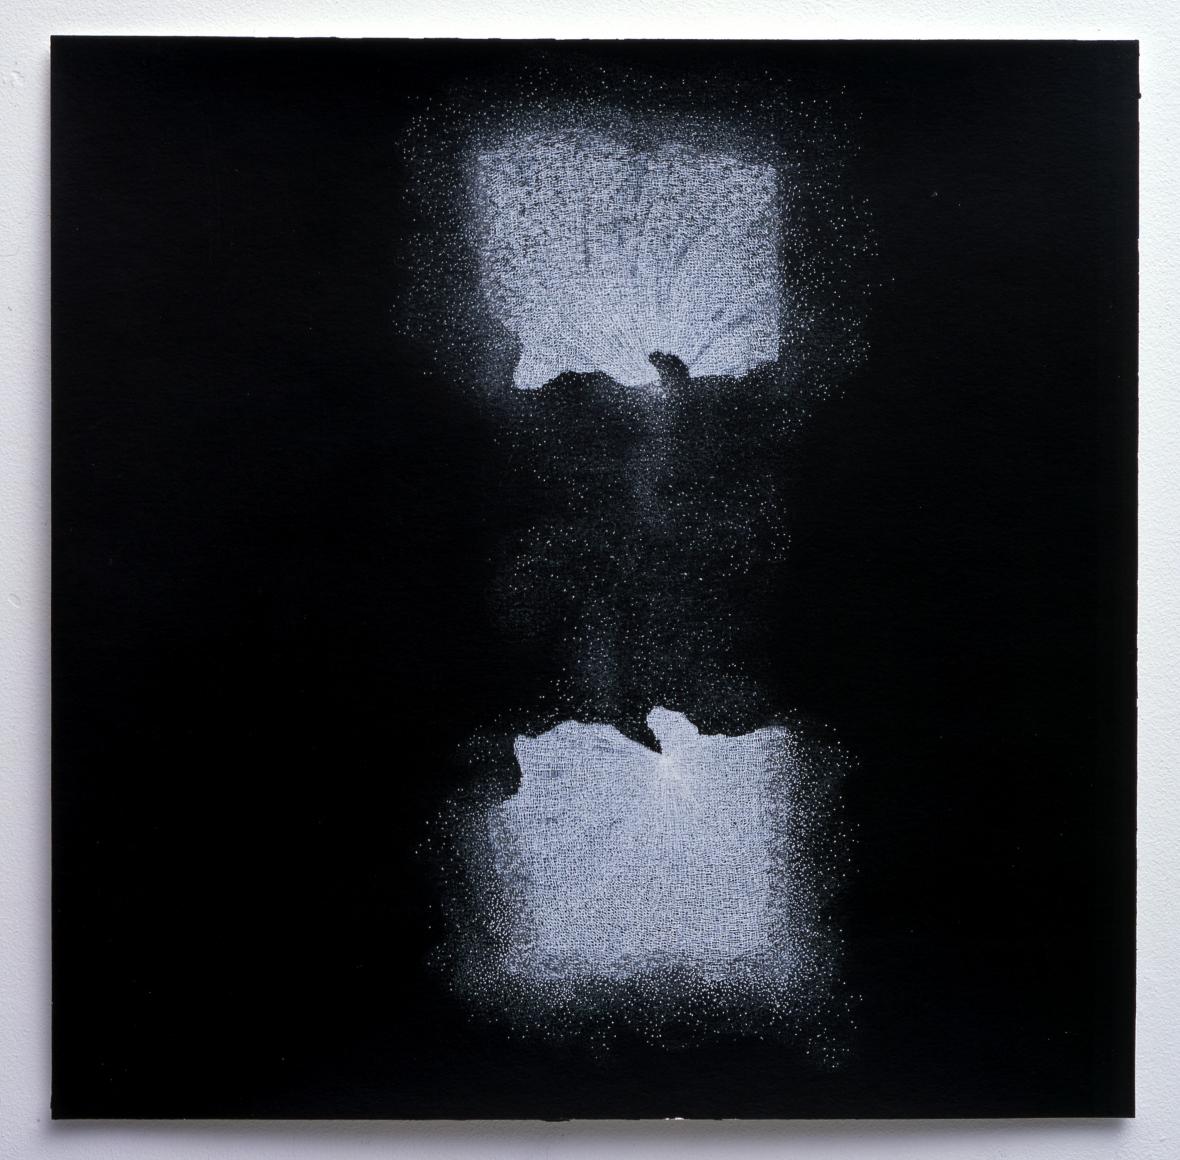 SHIRAZEH HOUSHIARY, Untitled, 2004